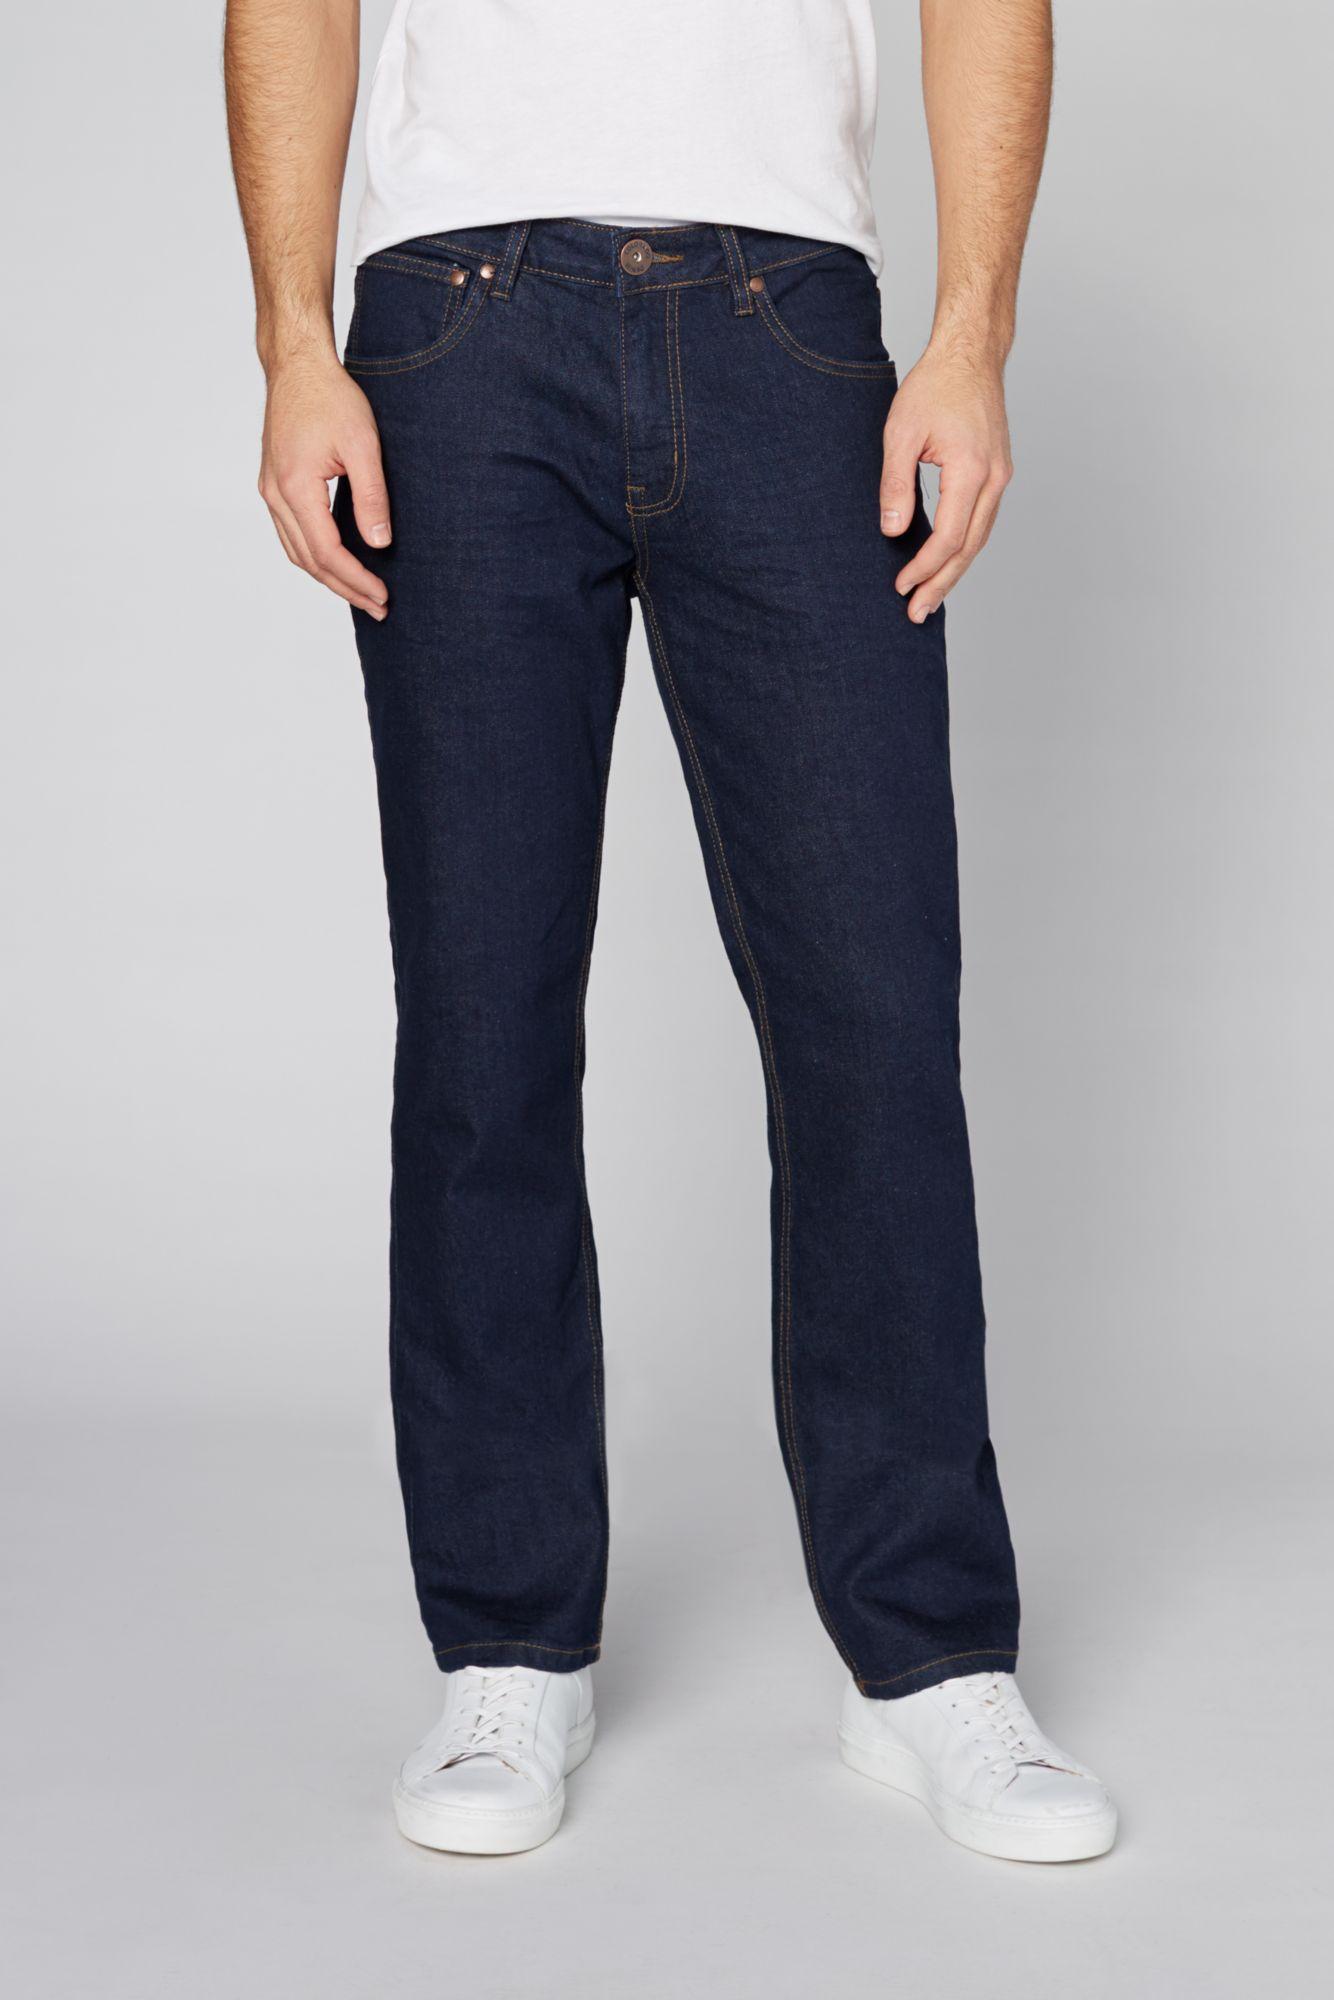 COLORADO DENIM  Jeans »C932 Herren Jeans Classic«